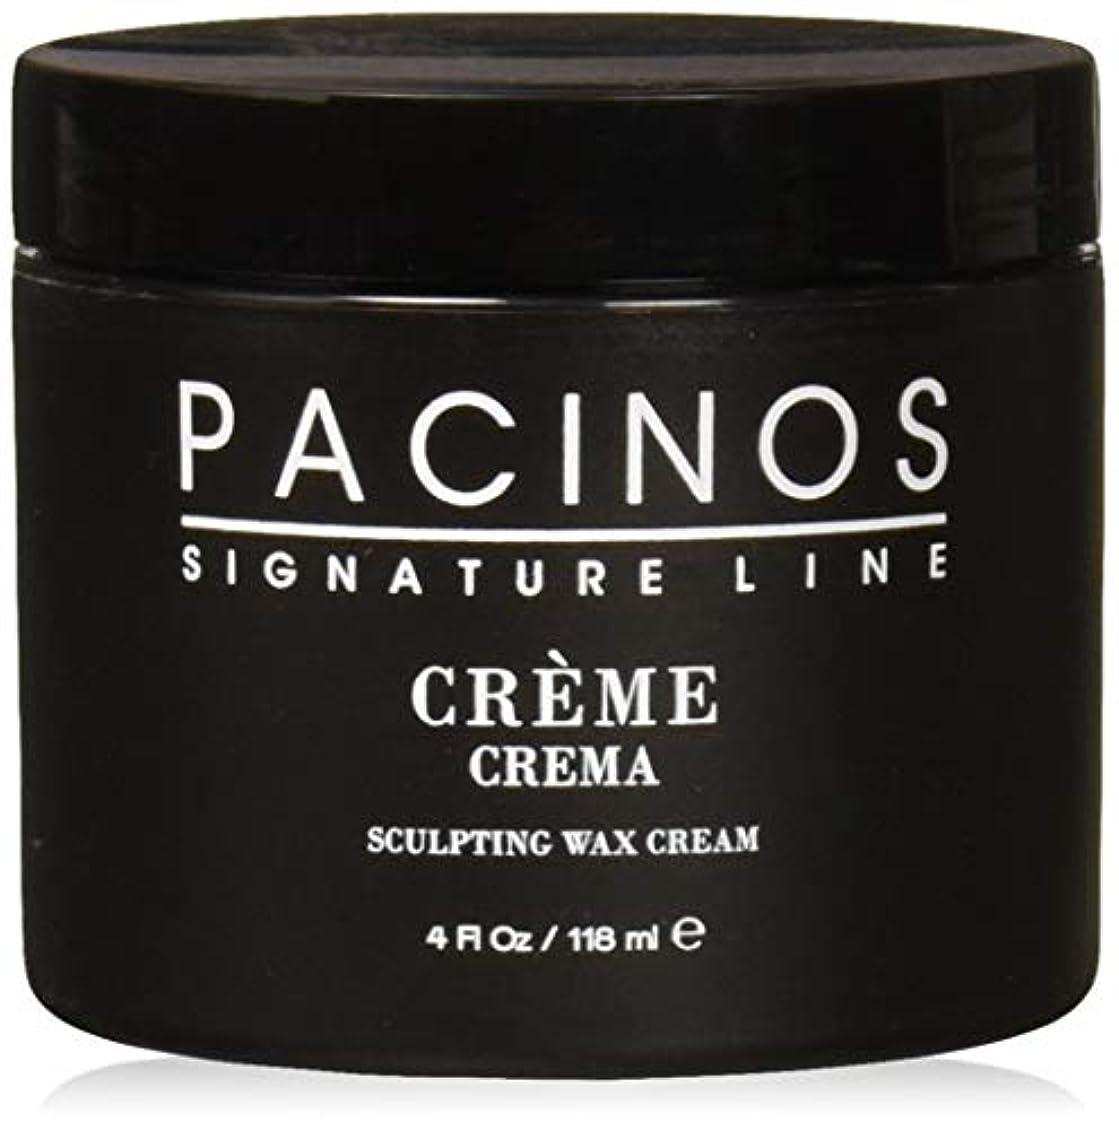 熱狂的な講堂検査官Pacinos Grooming Elegance Creme, Sculpting Wax Cream 4oz by Pacinos [並行輸入品]